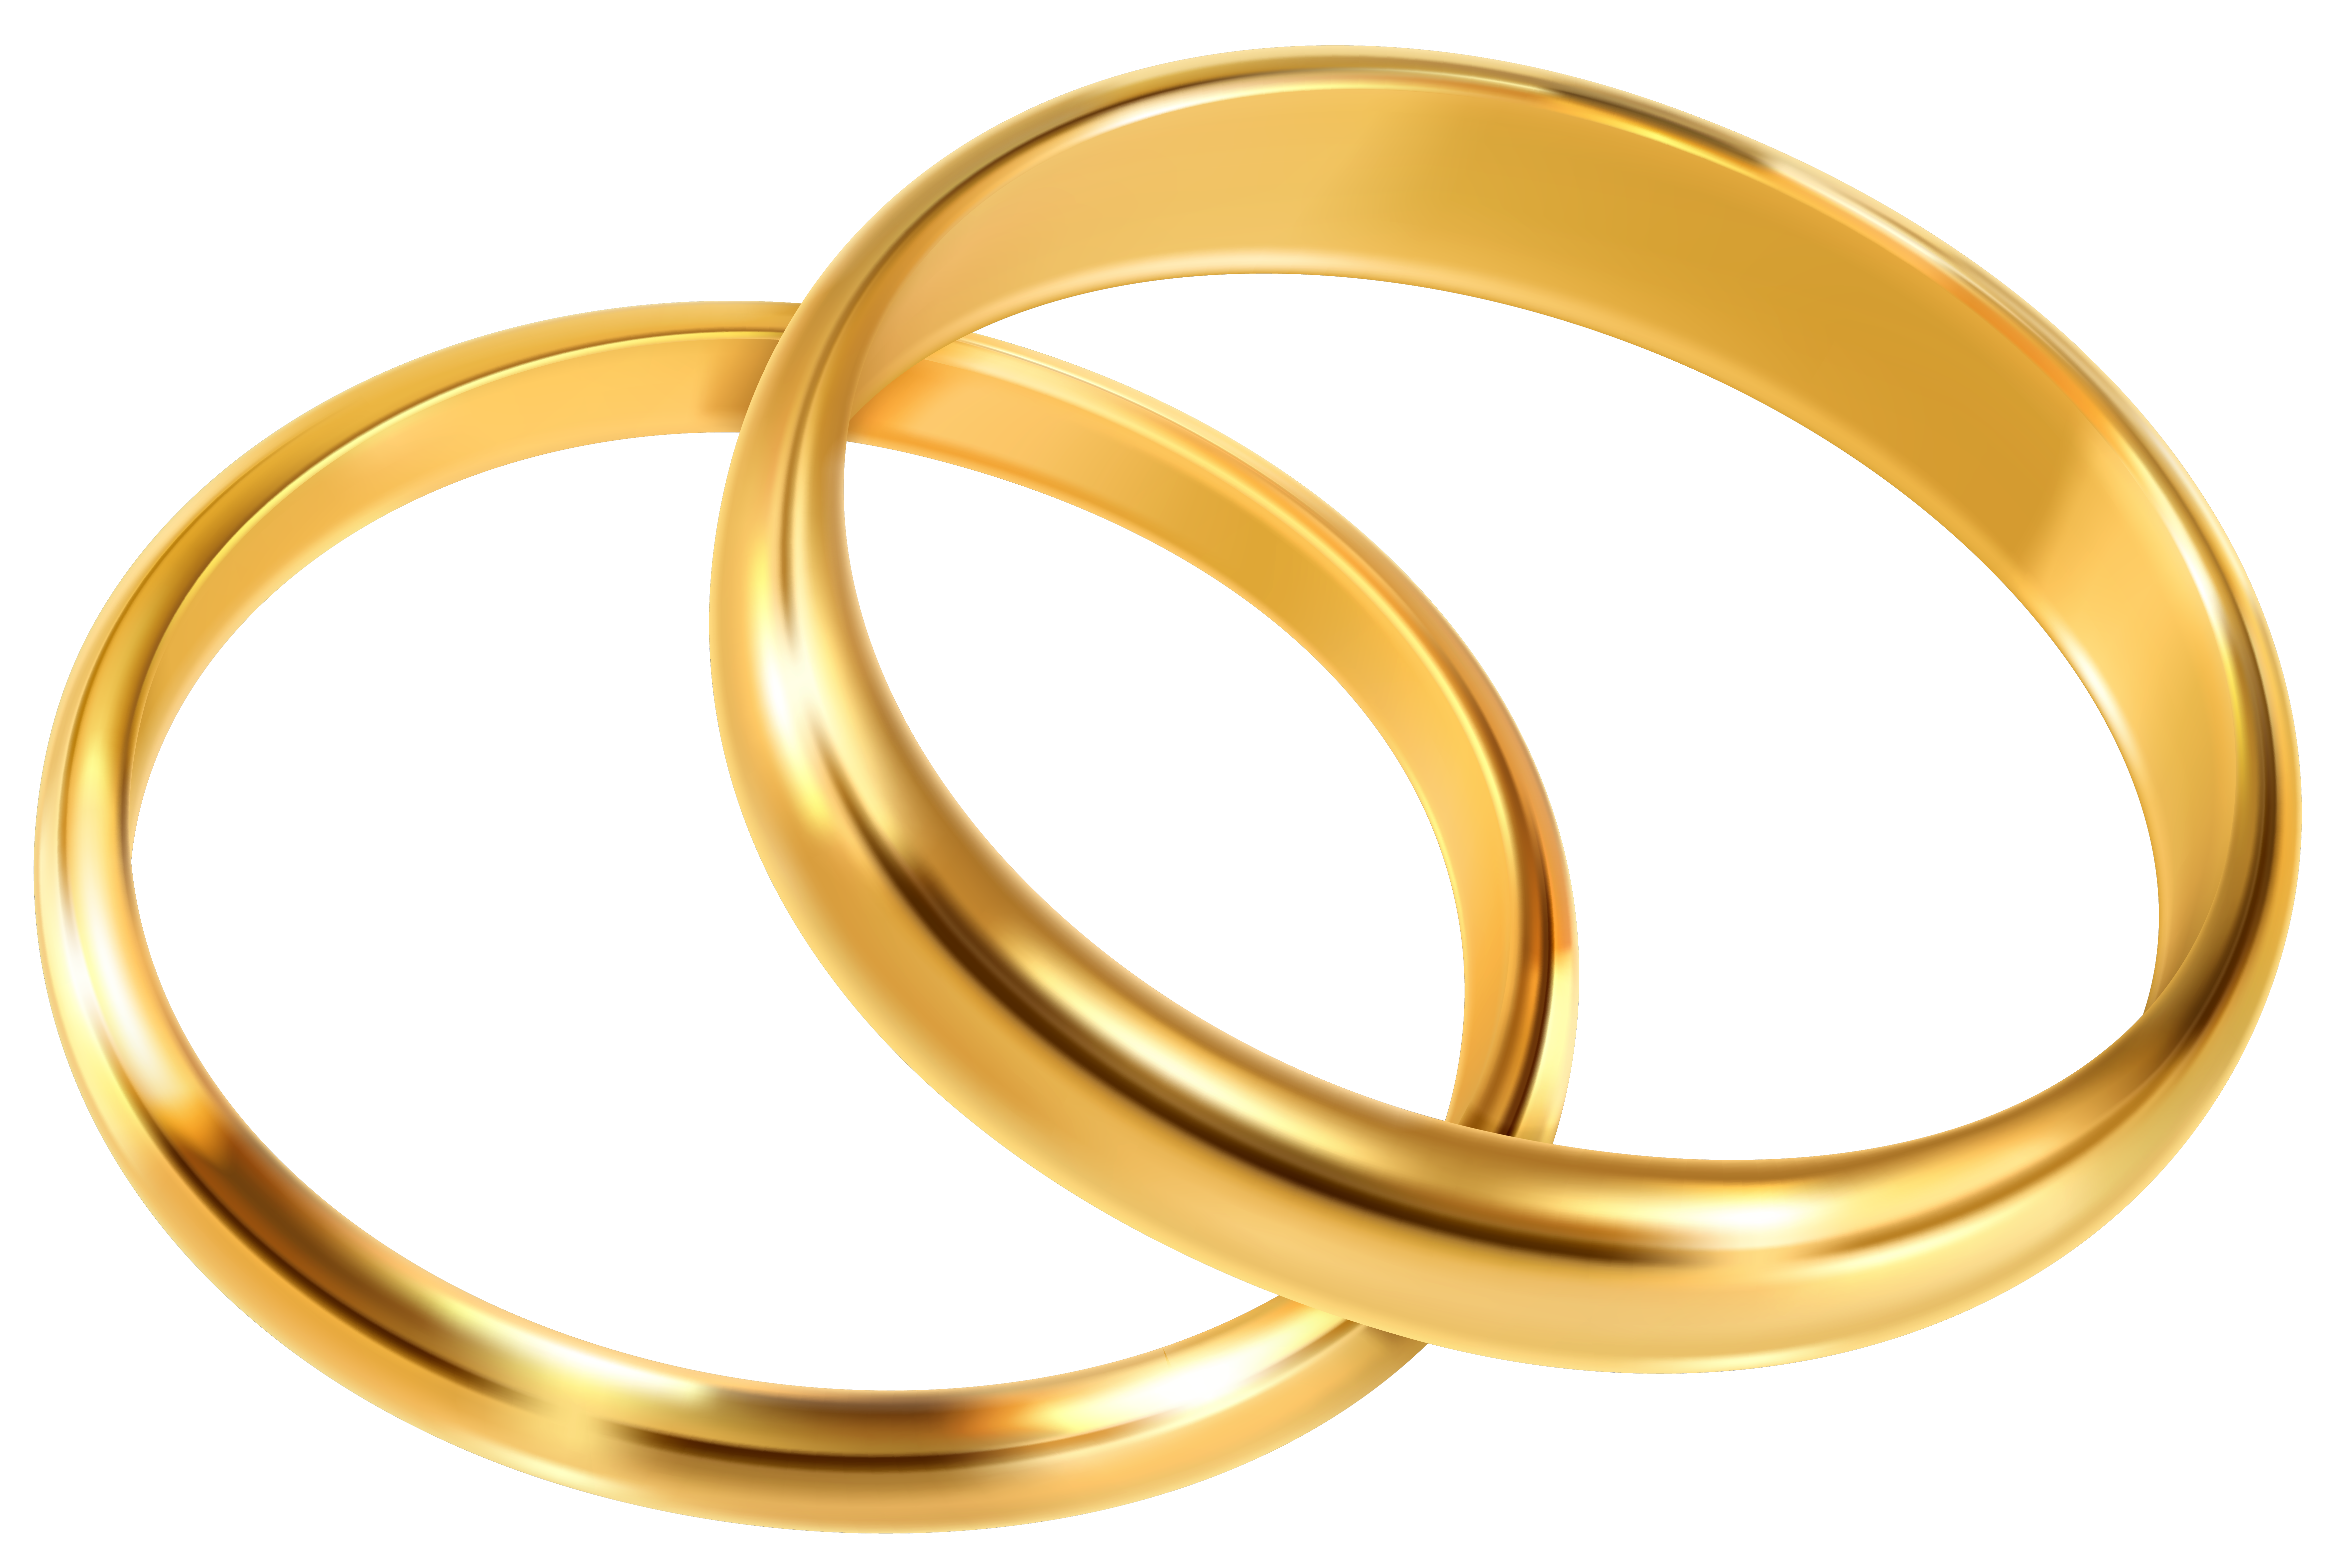 7047x4717 Wedding Rings Png Clip Art Imageu200b Gallery Yopriceville